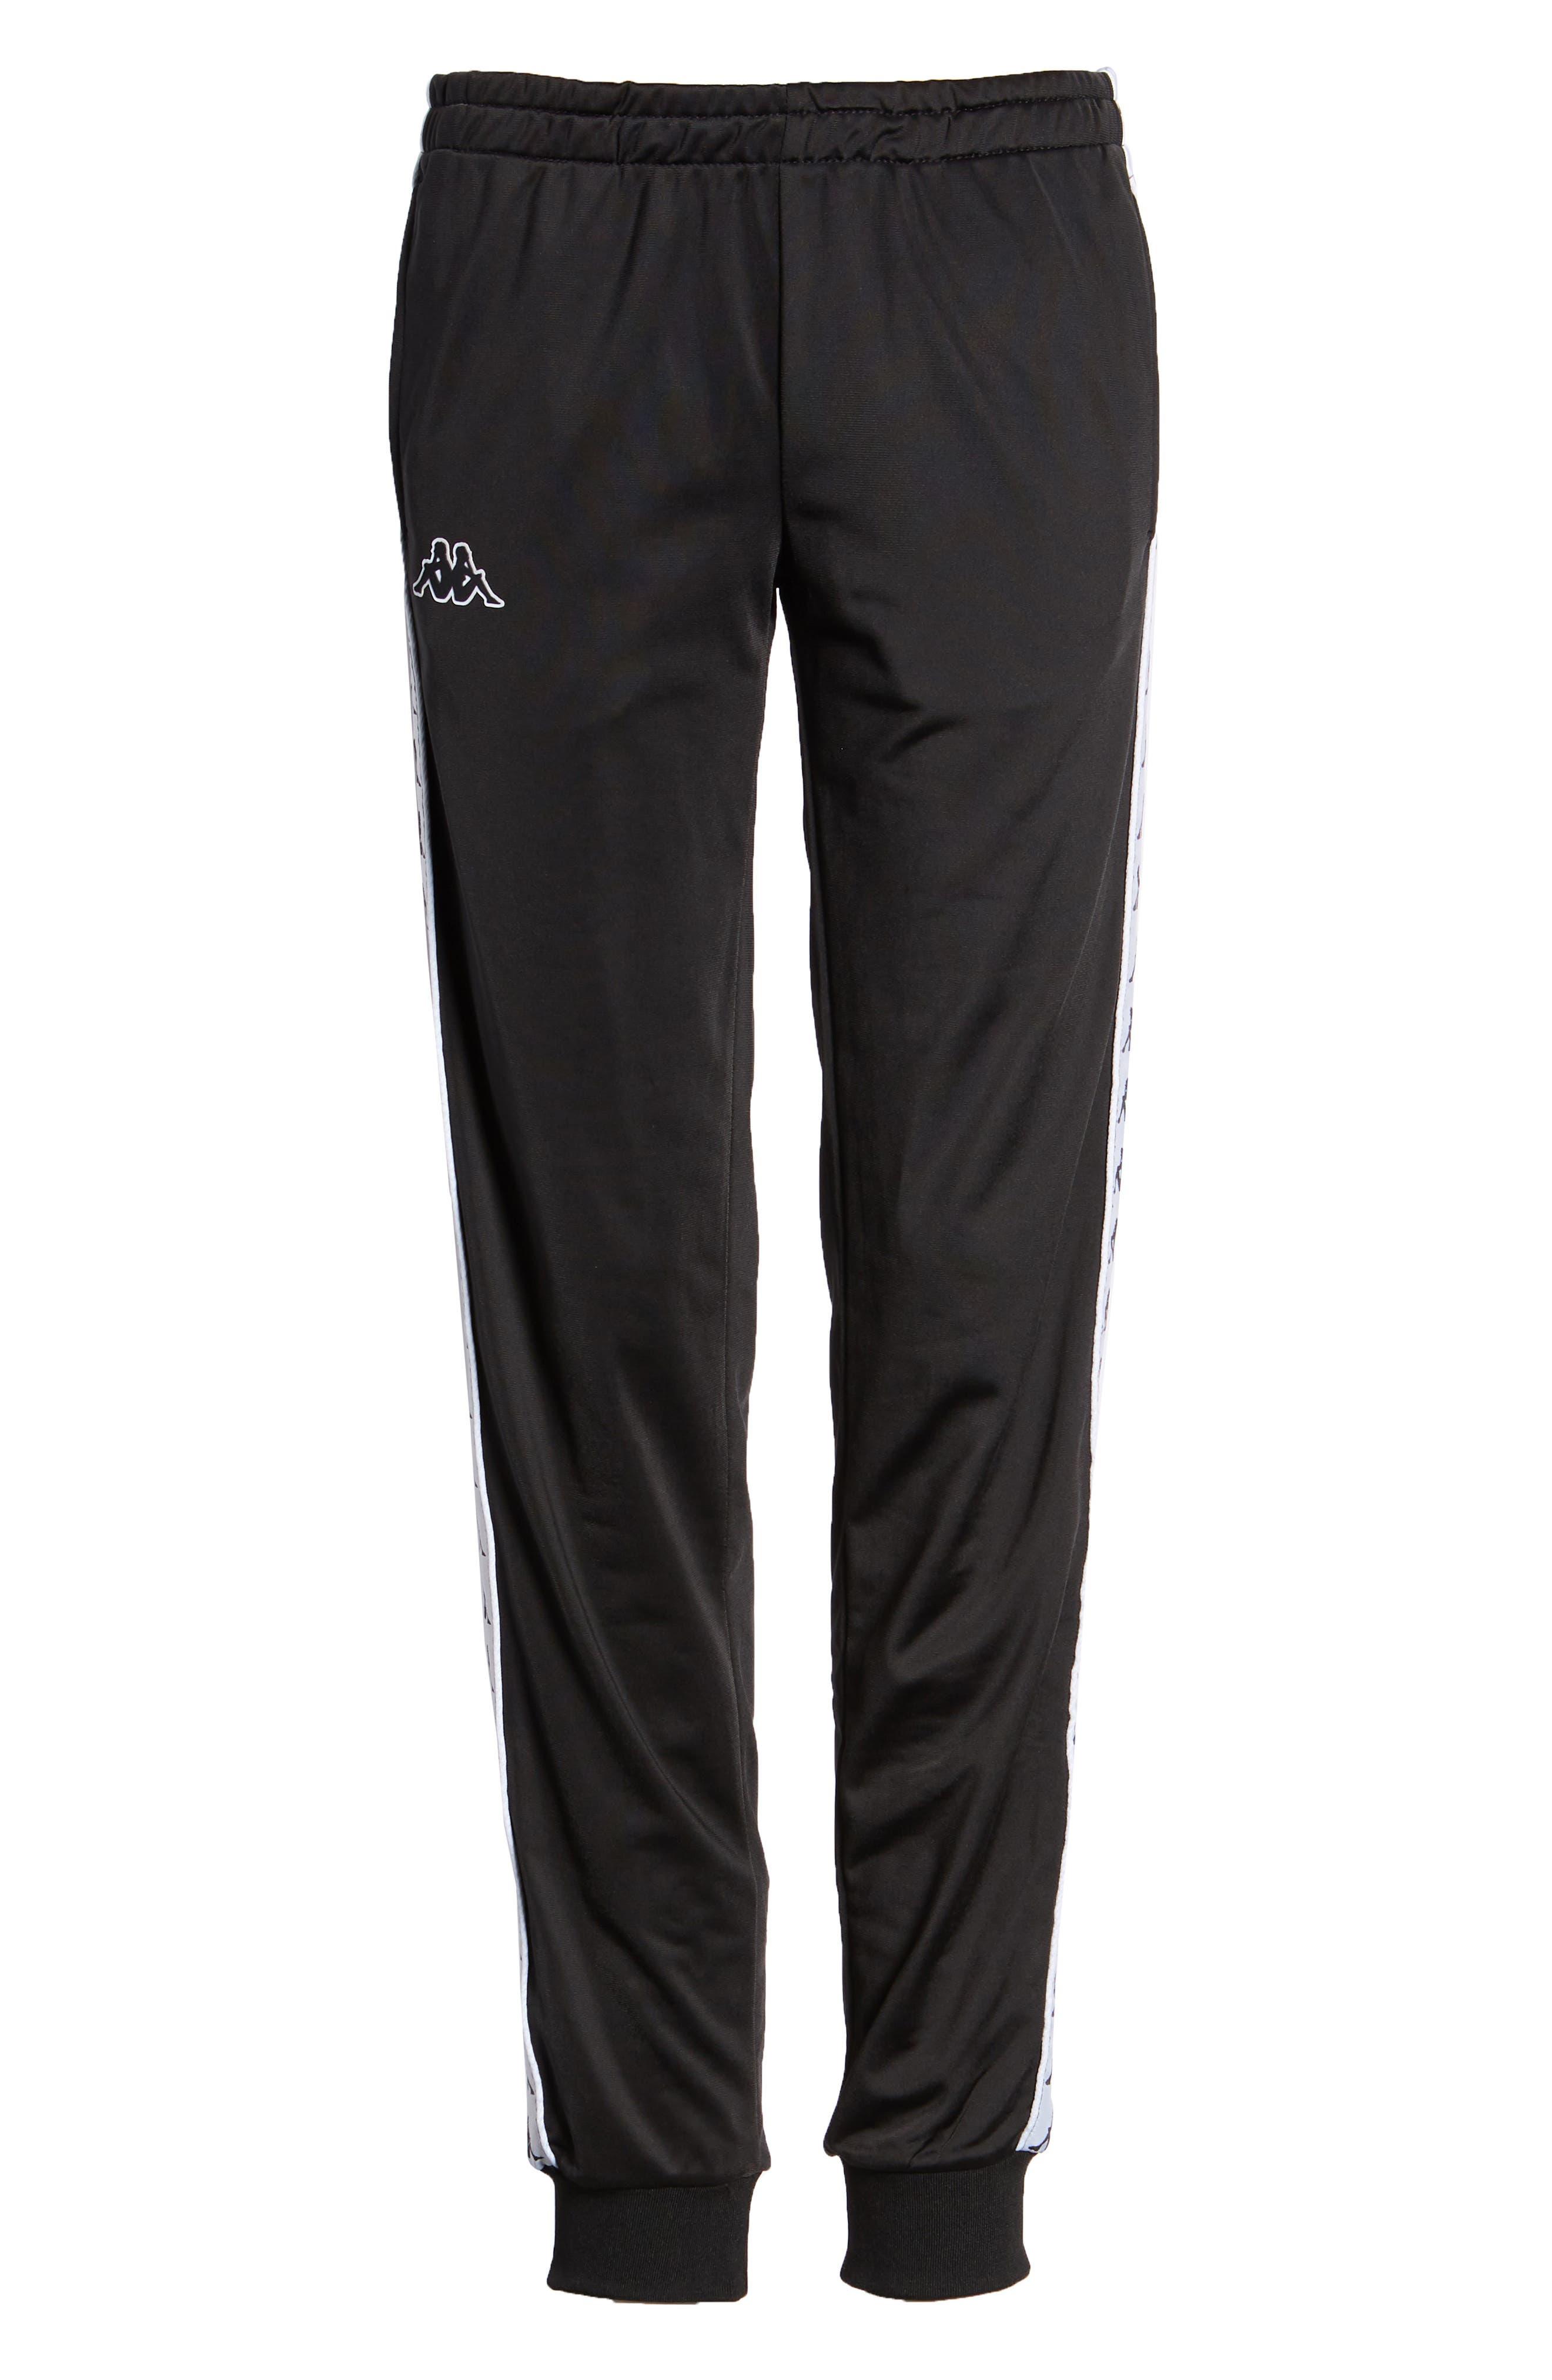 Banda Pants,                             Main thumbnail 1, color,                             Black/ White